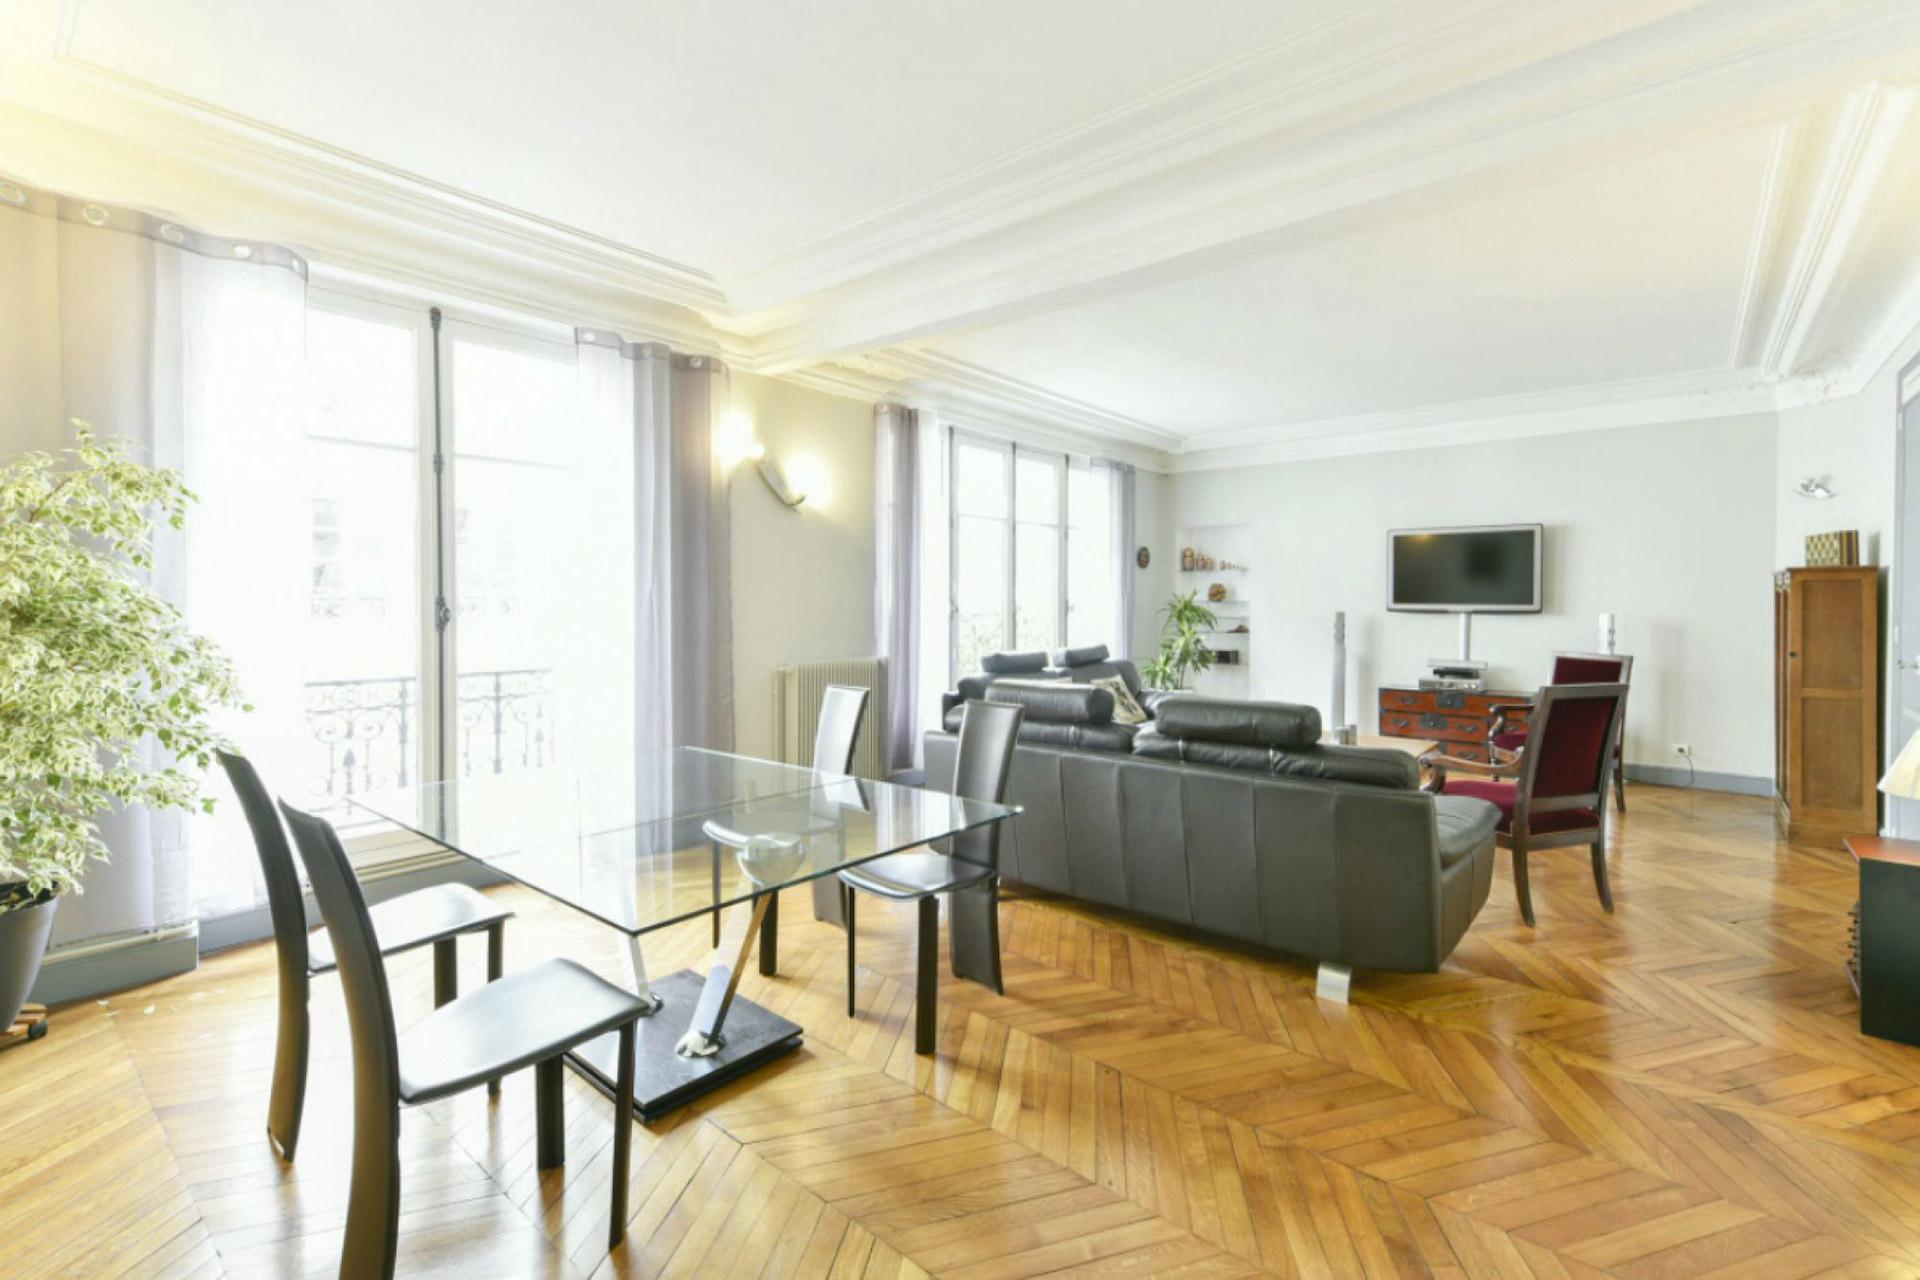 Paris Apartments for Sale | Buy Real Estate in Paris